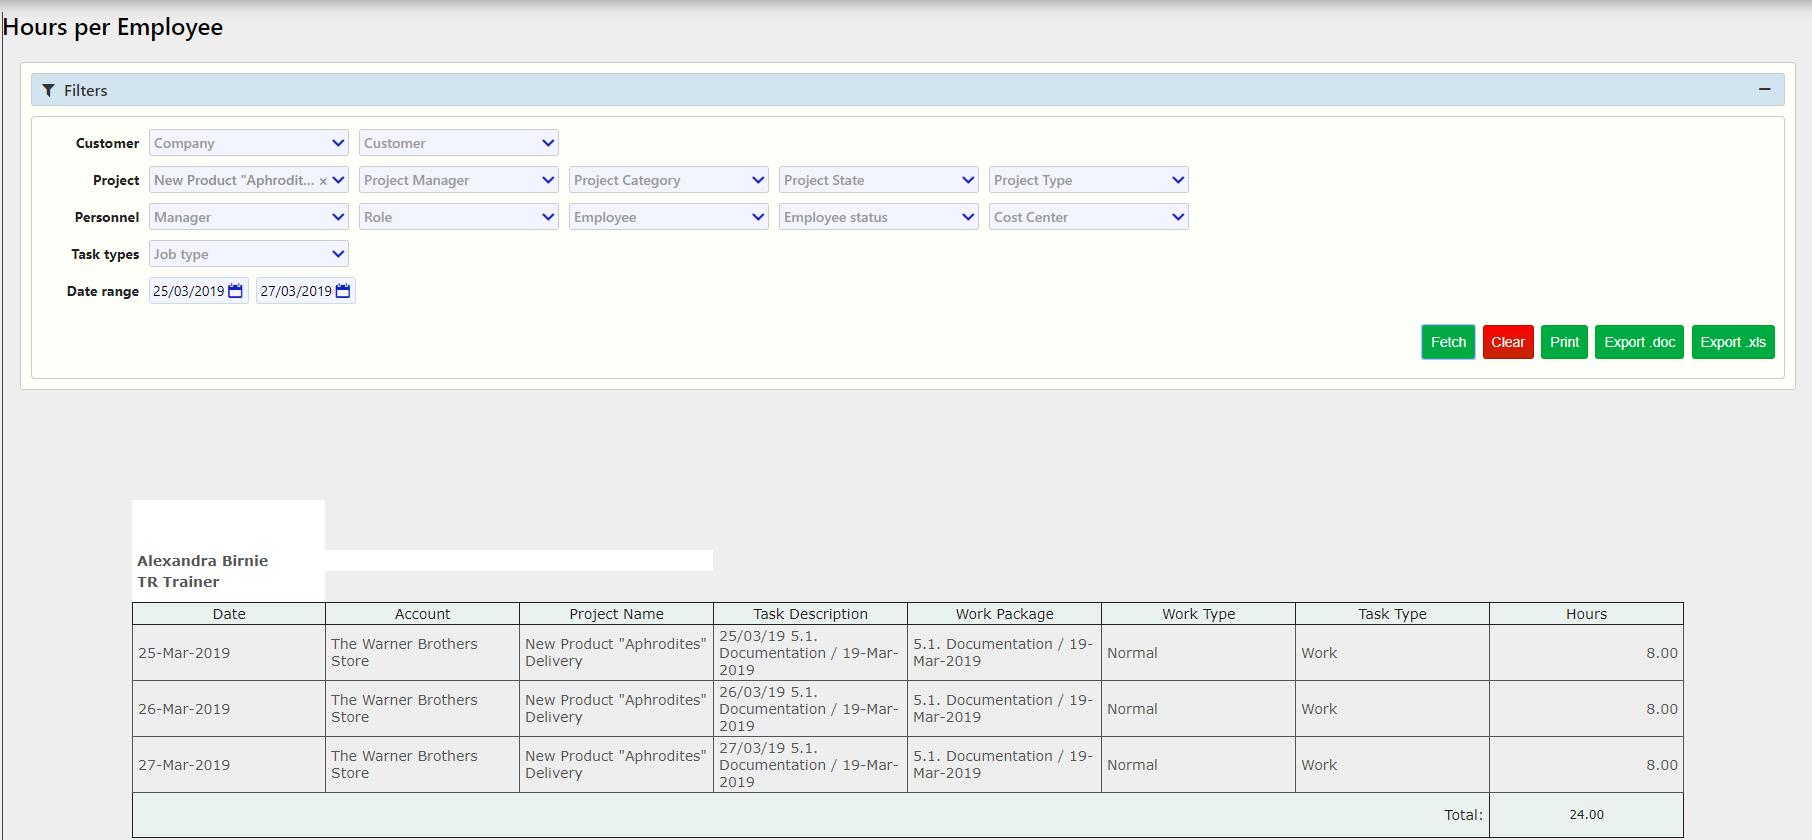 hours per employee / Comidor Digital Automation Platform